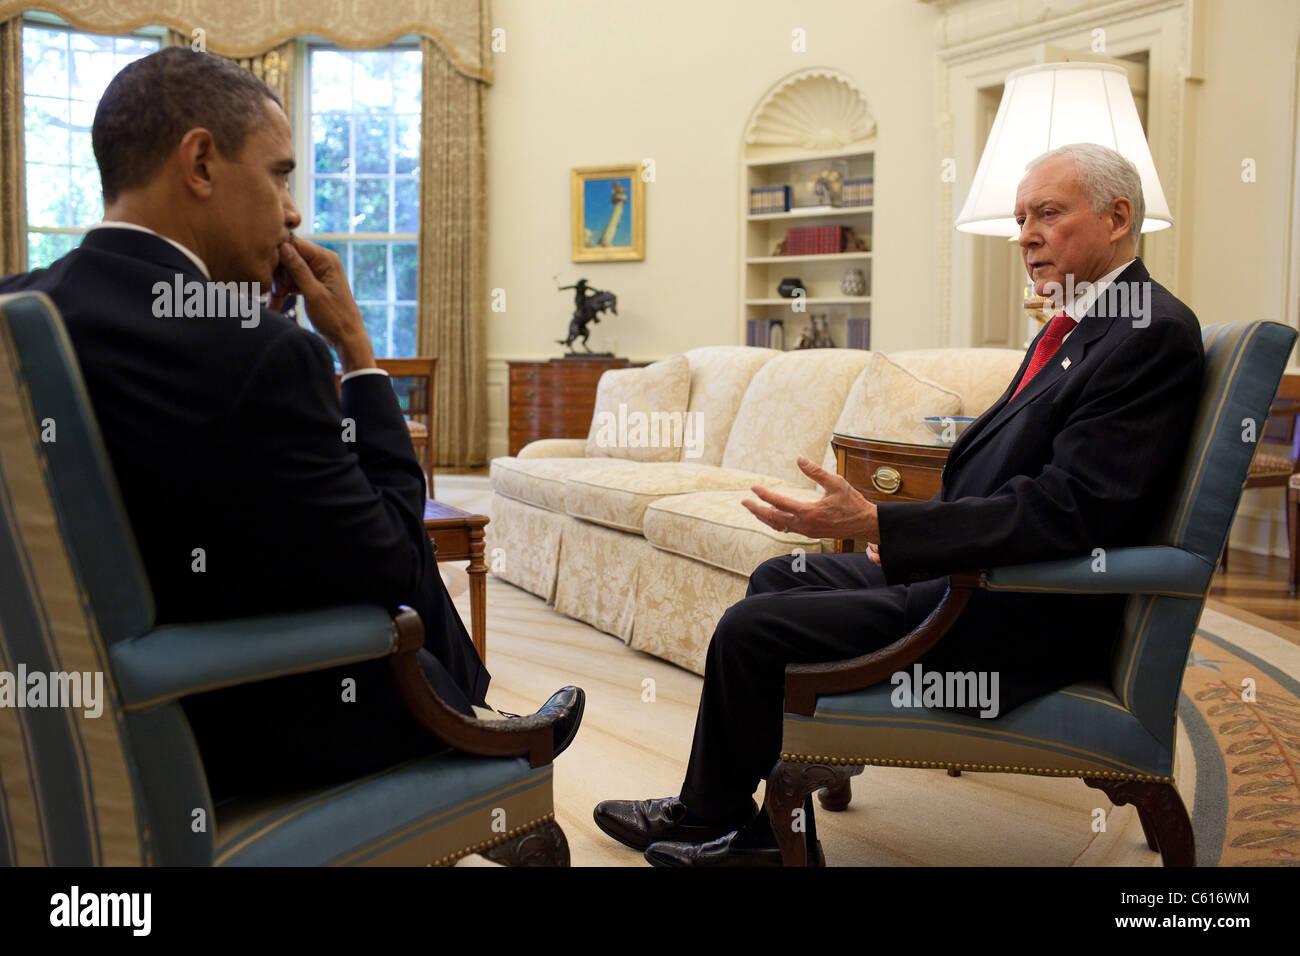 Präsident Barack Obama trifft sich mit Senator Orrin Hatch im Oval Office. 5. Mai 2010. (BSWH_2011_8_343) Stockbild